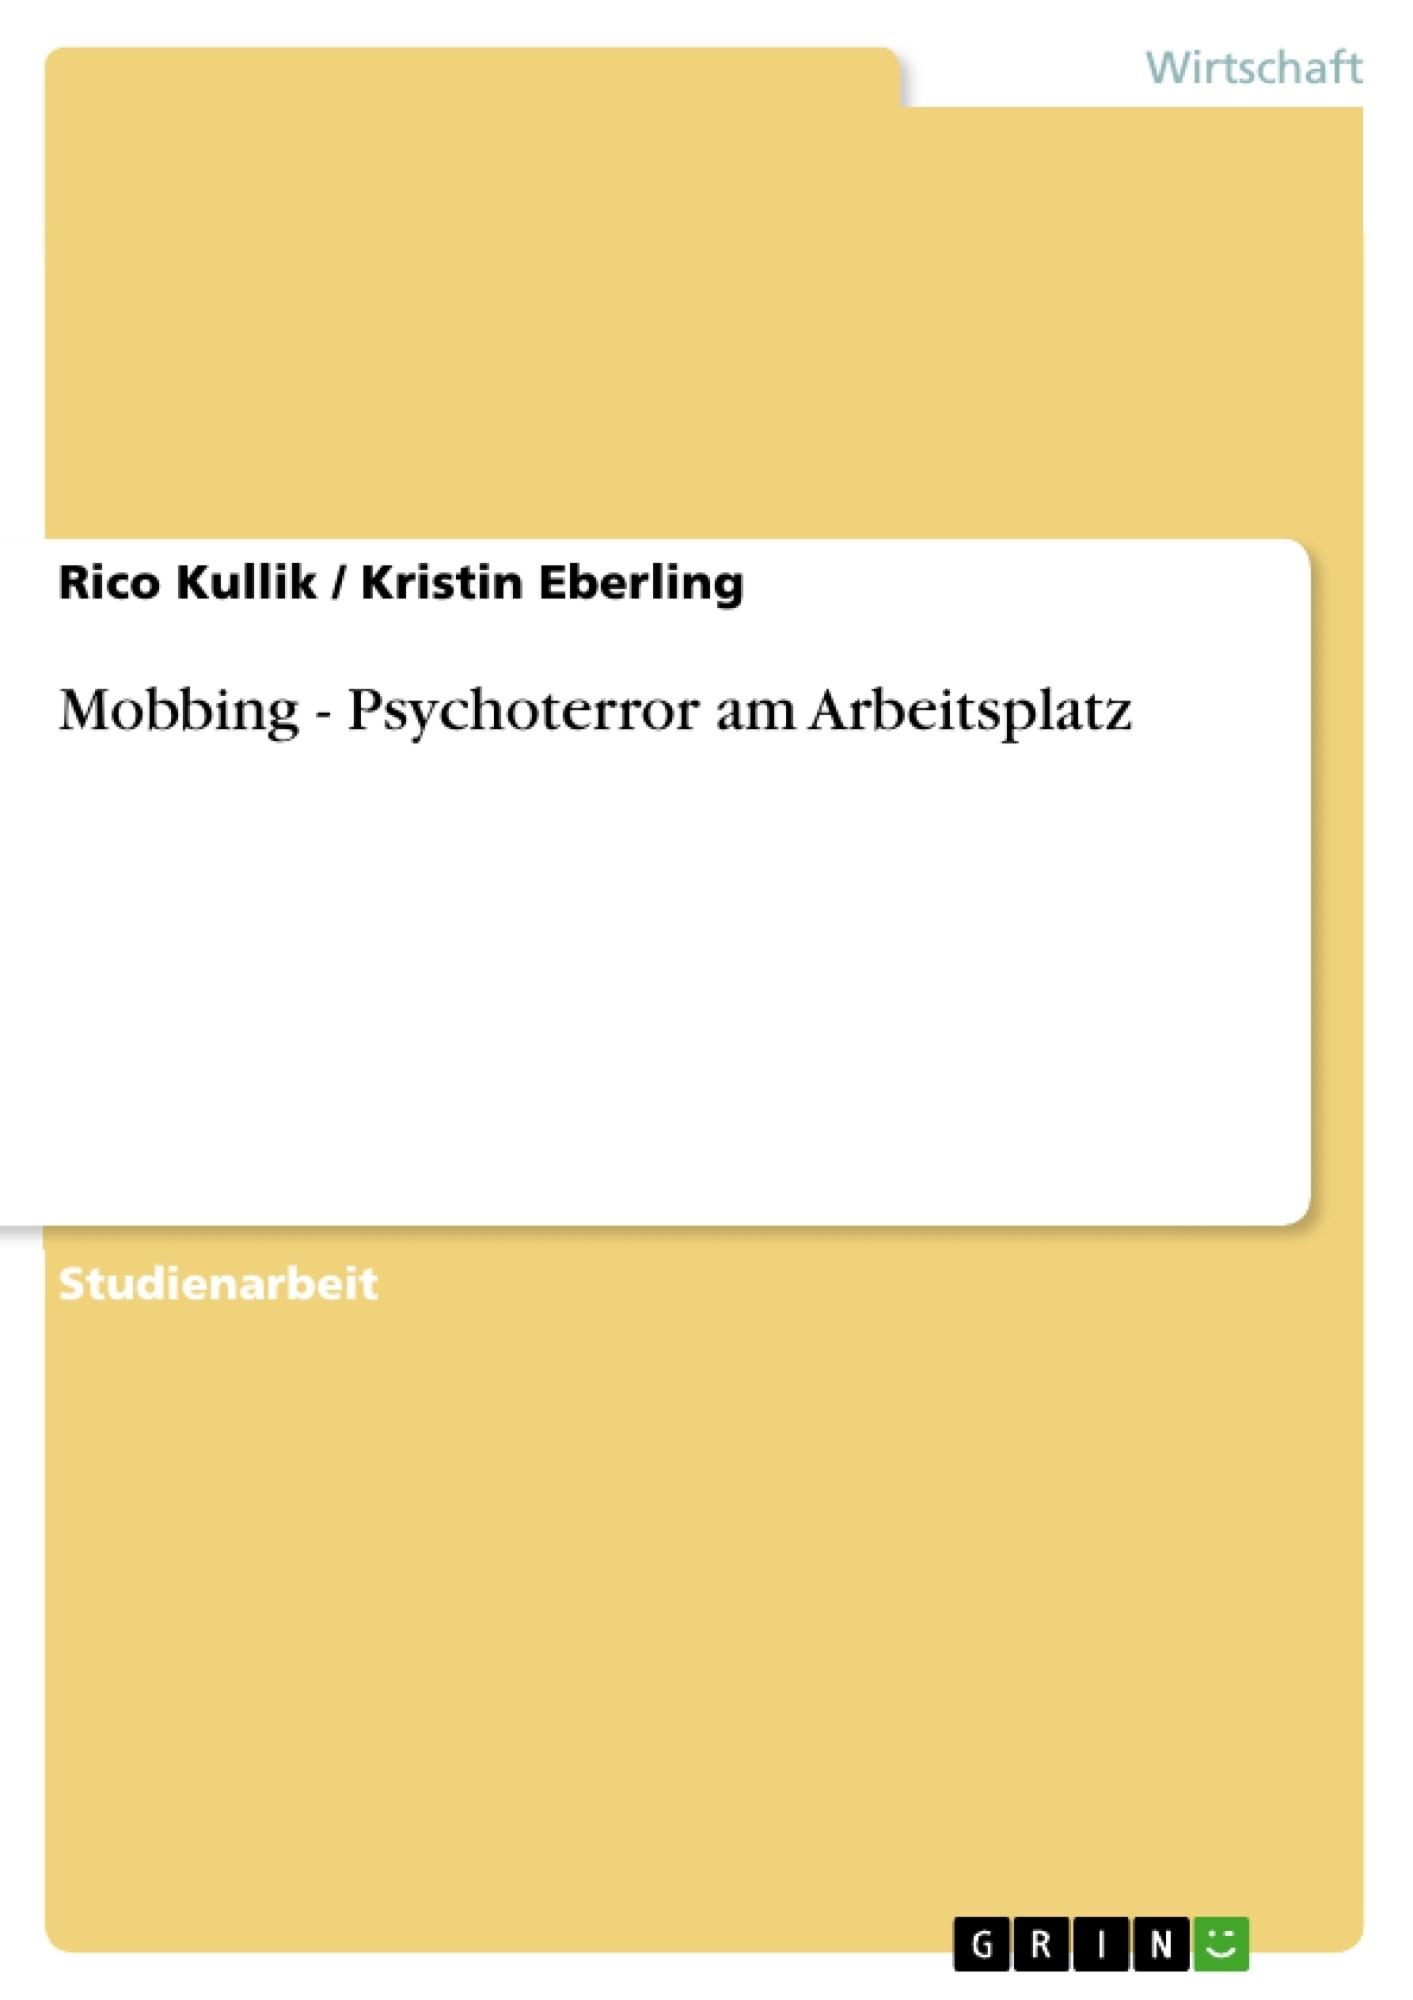 Titel: Mobbing - Psychoterror am Arbeitsplatz